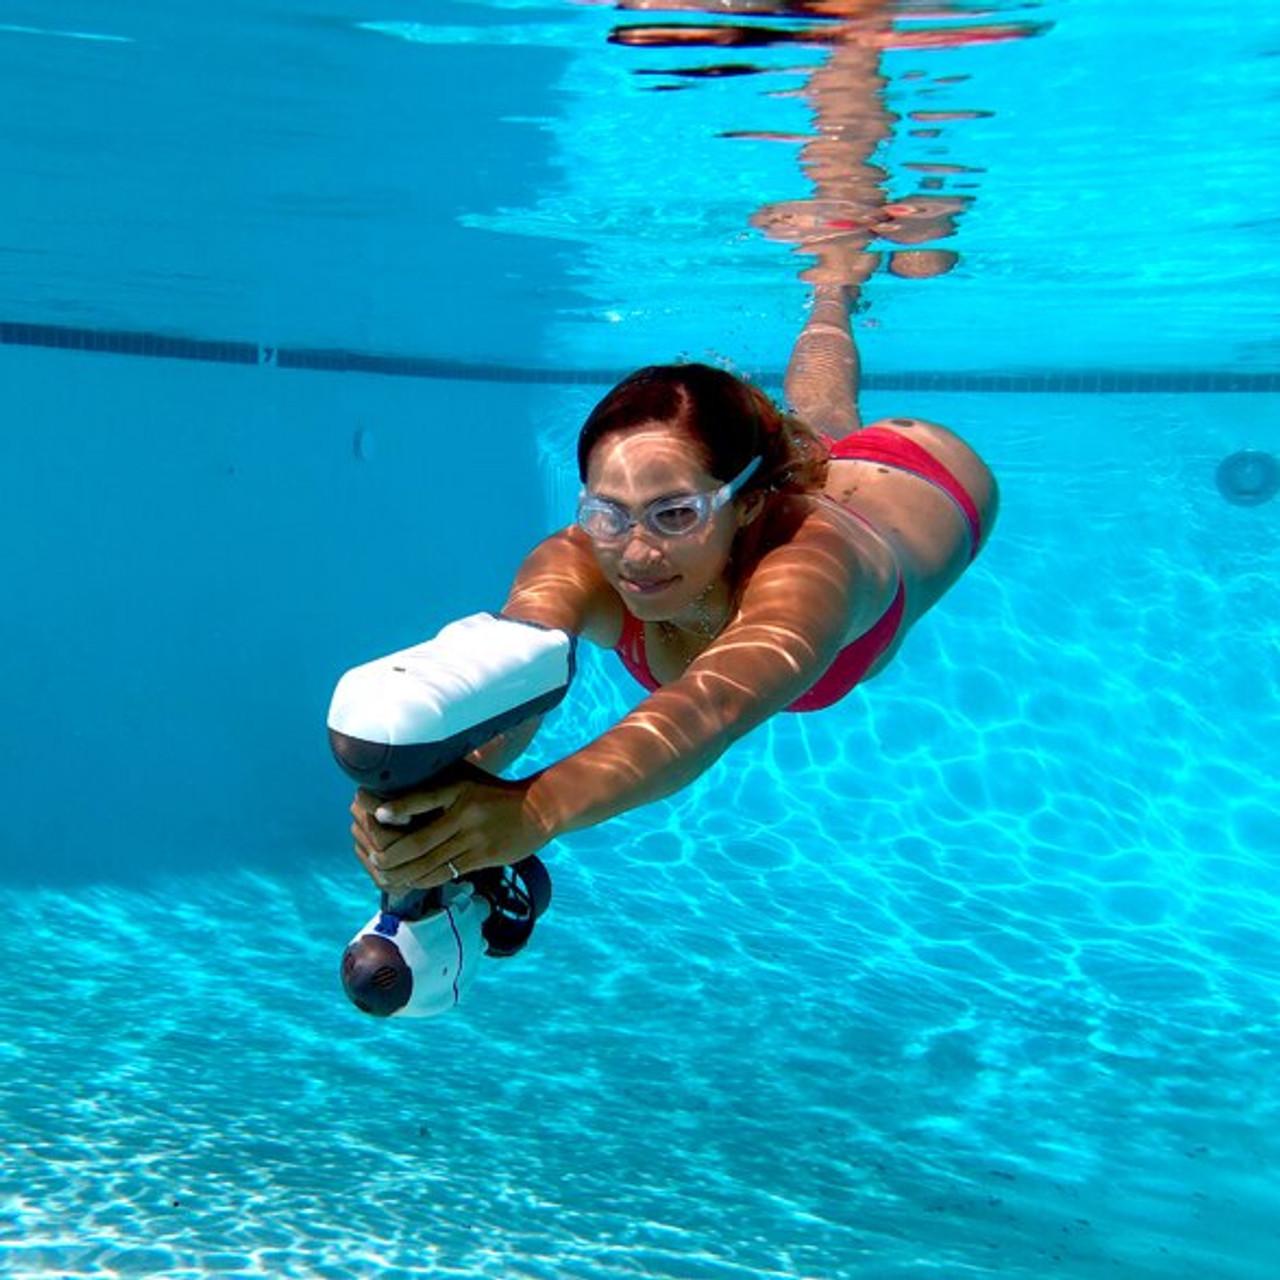 Bixpy Swim Jet Handheld Battery - Scuba Edition